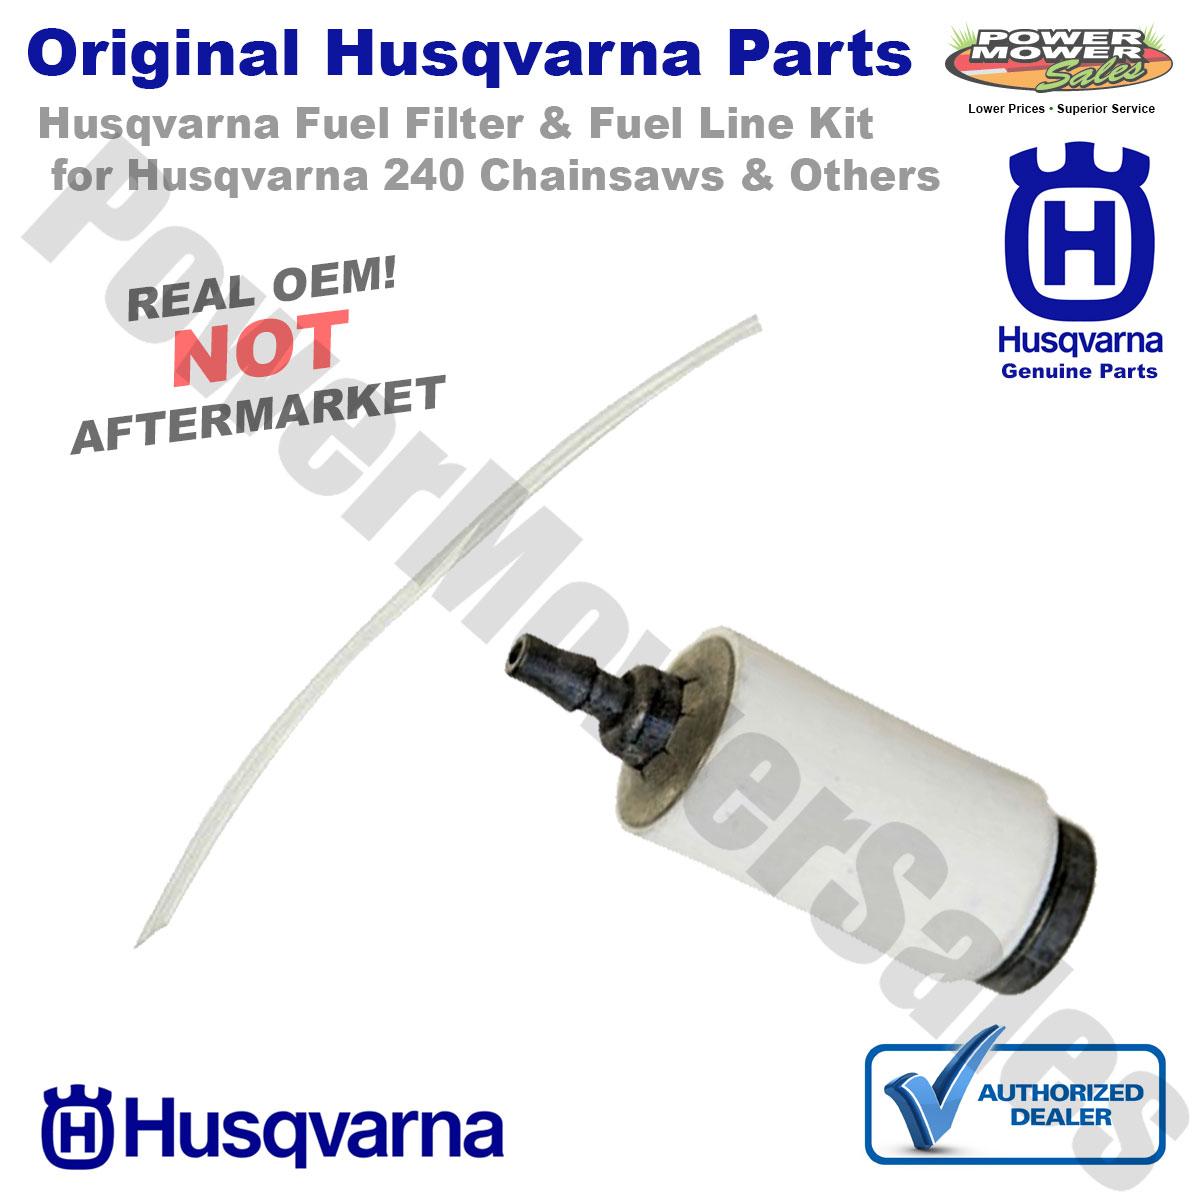 Genuine OEM 530069216 530069247 530095646 Fuel Line Kit with Filter